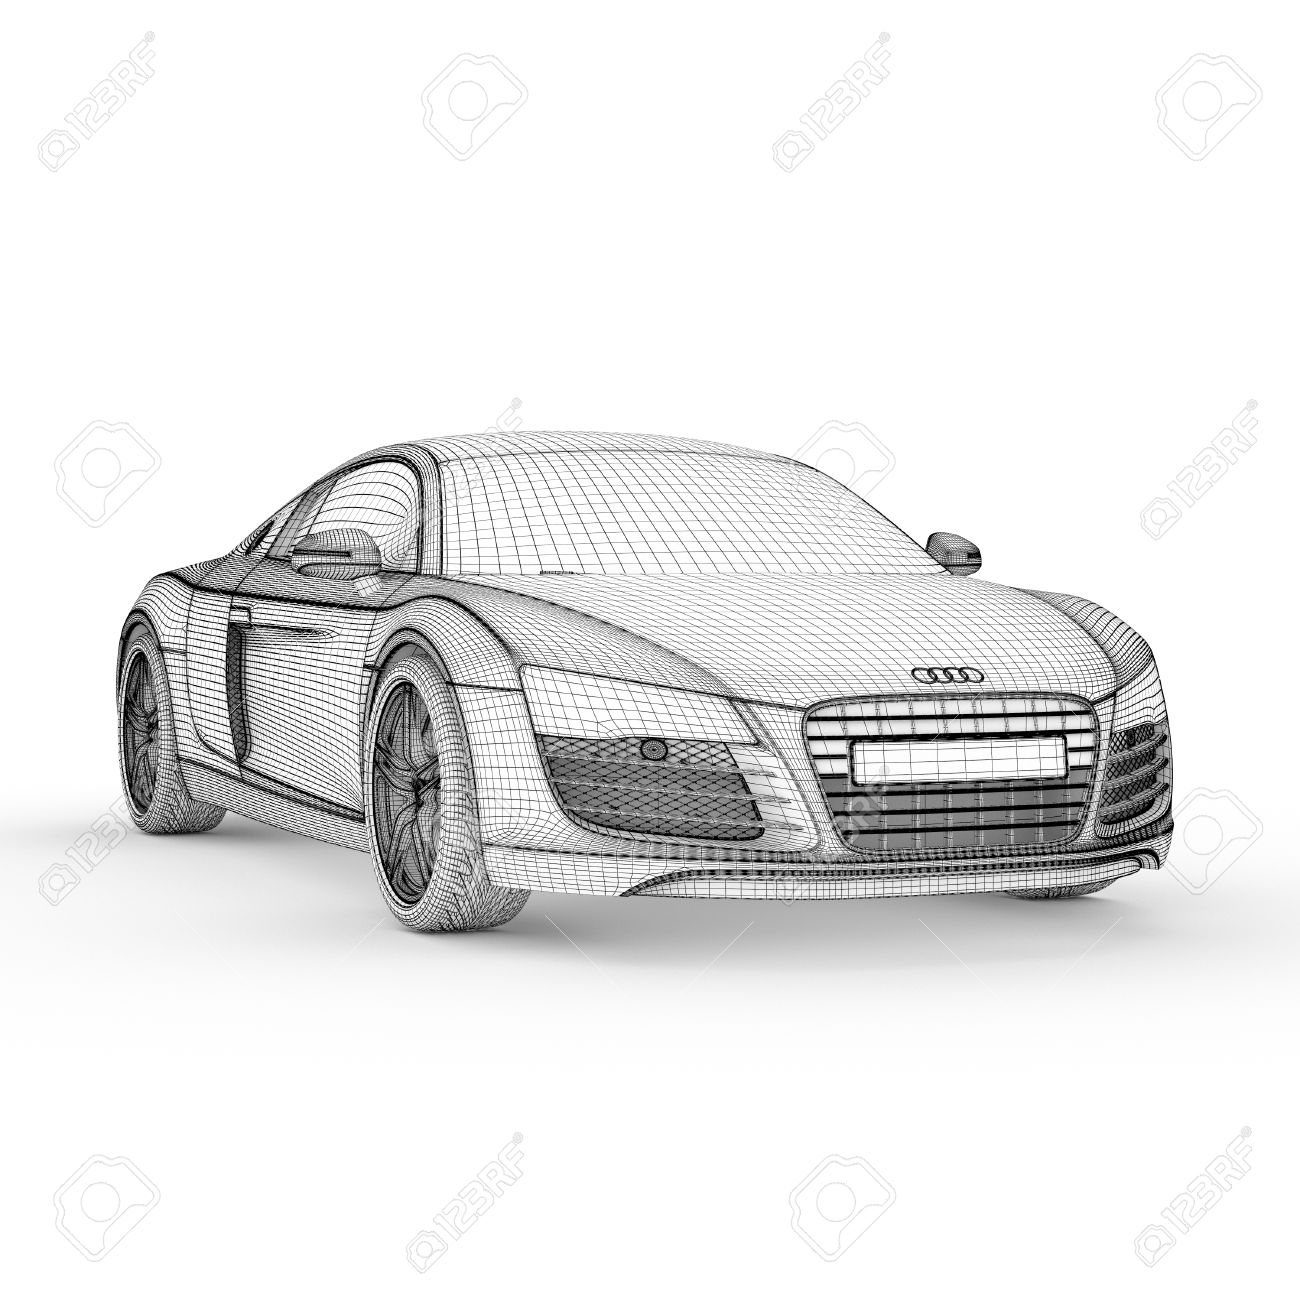 Car Model Drawing Graphic Design 3d Illustration Stock Photo ...